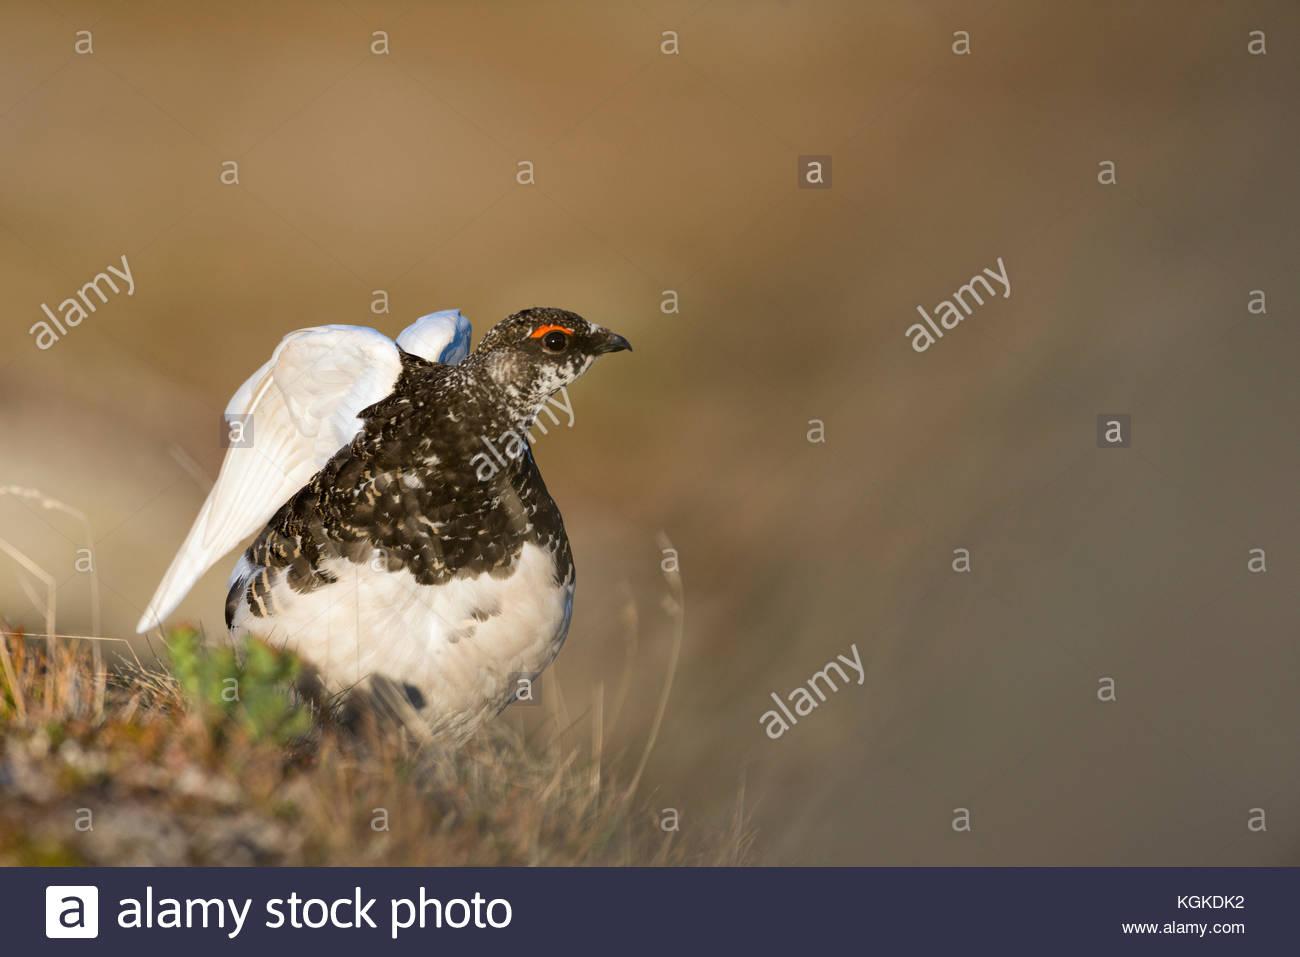 Rock Ptarmigan, Lagoupus muta, stretching it's wings. - Stock Image